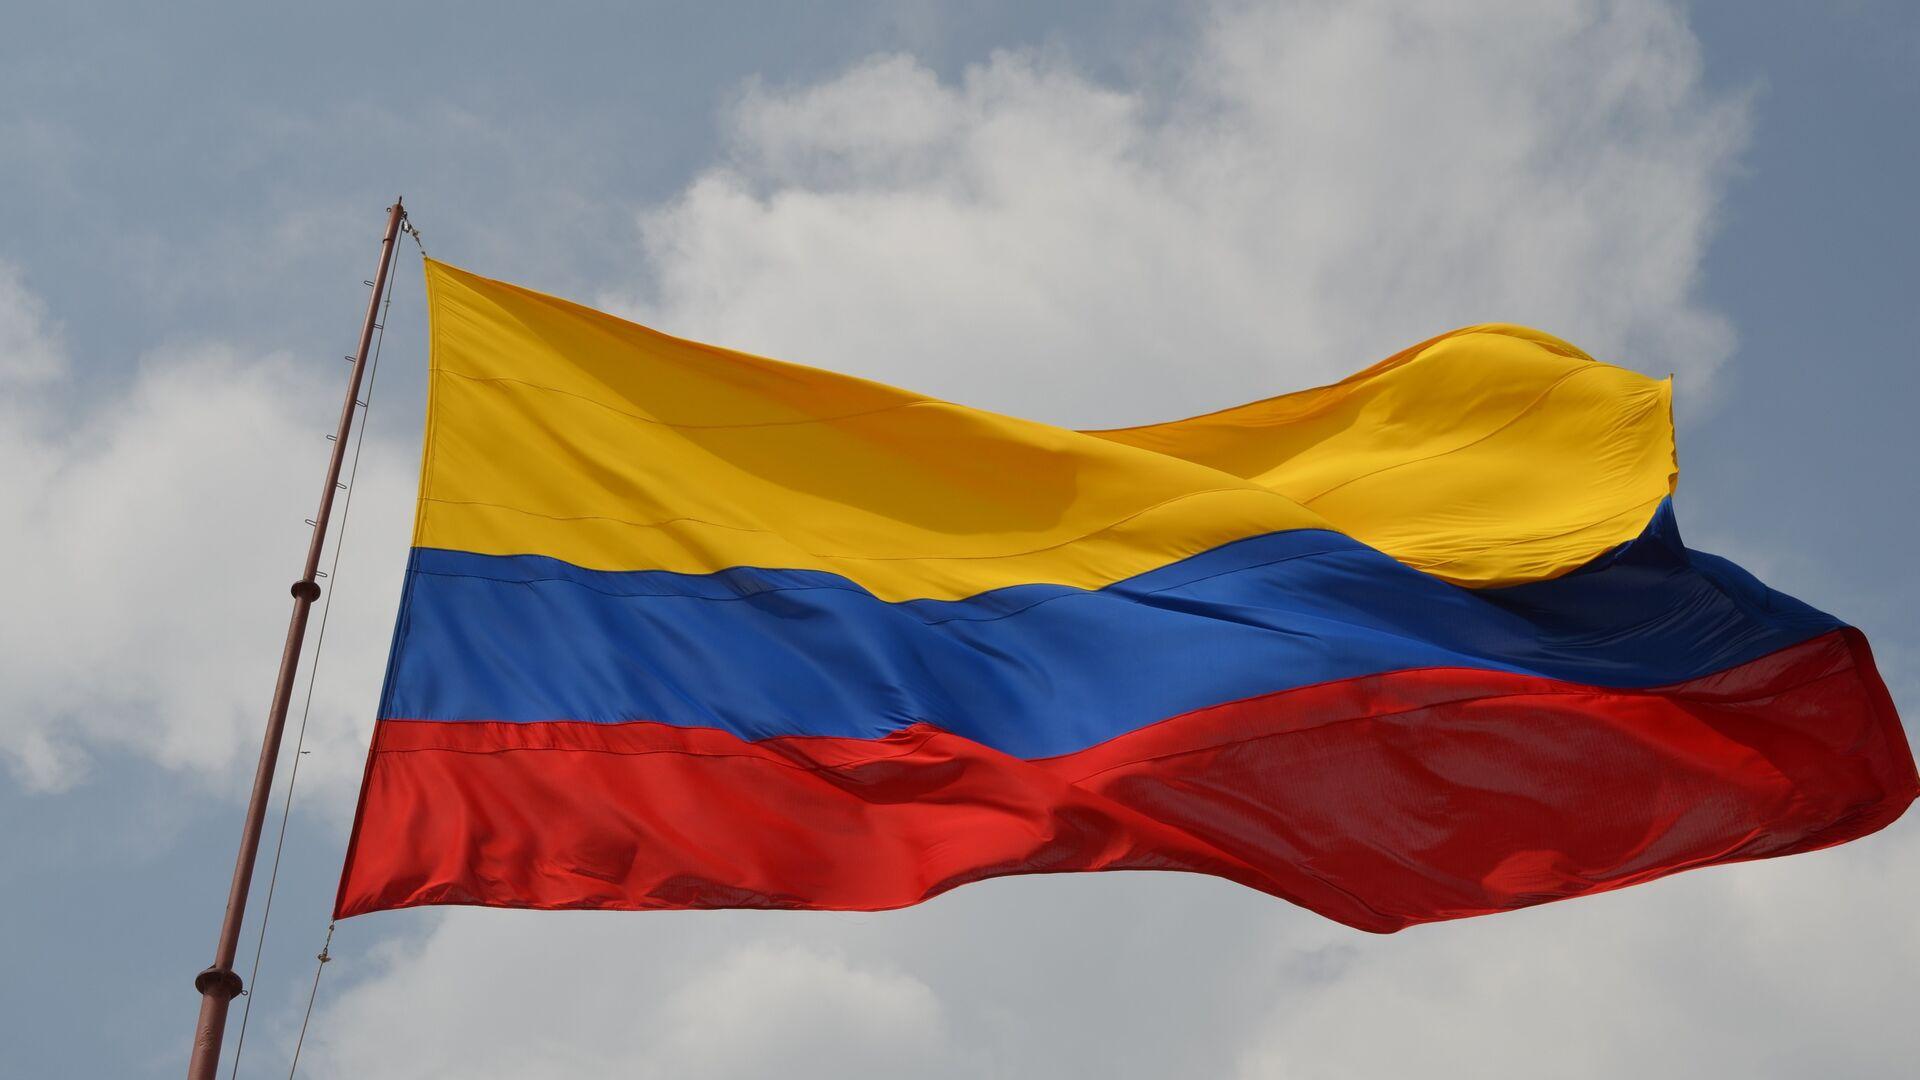 Bandera de Colombia - Sputnik Mundo, 1920, 23.09.2021